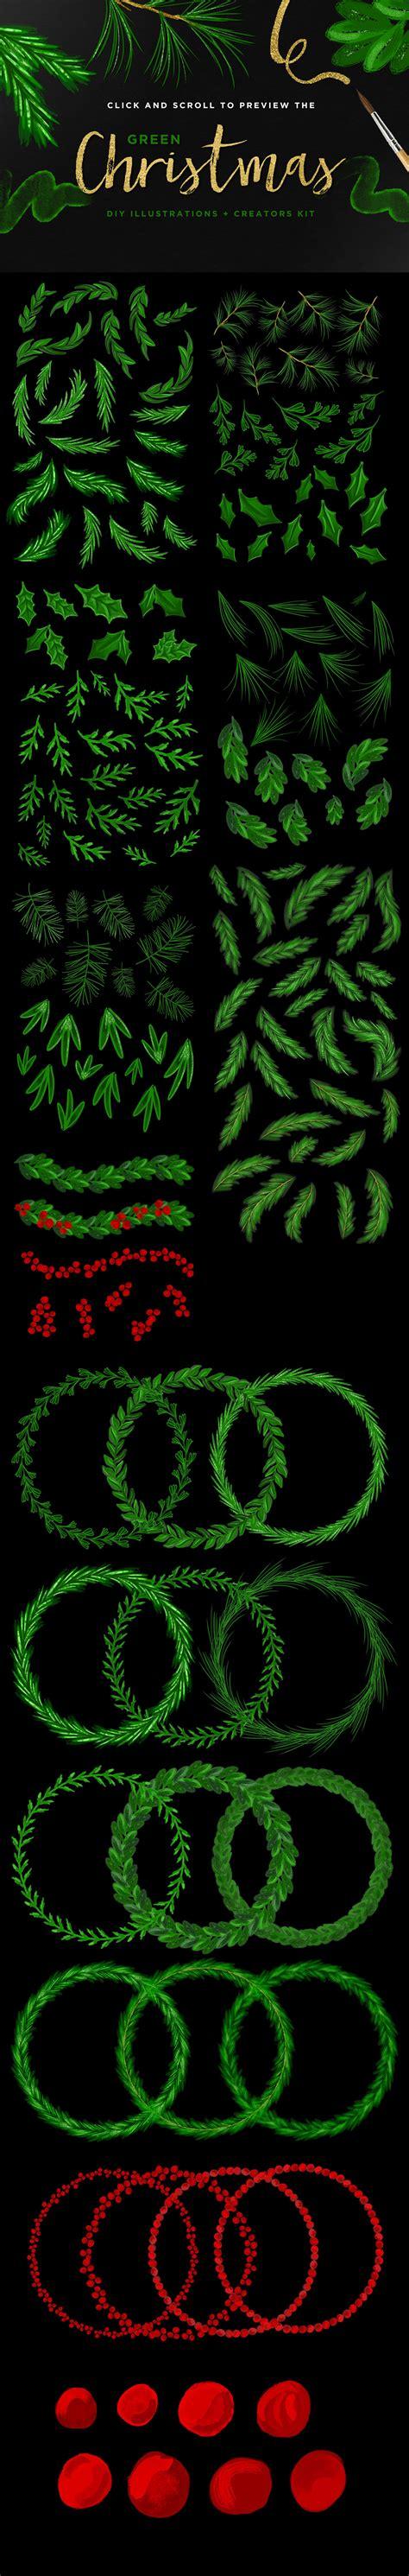 loot games themes ultimate holiday bundle christmas illustration bundle eu illustrations on